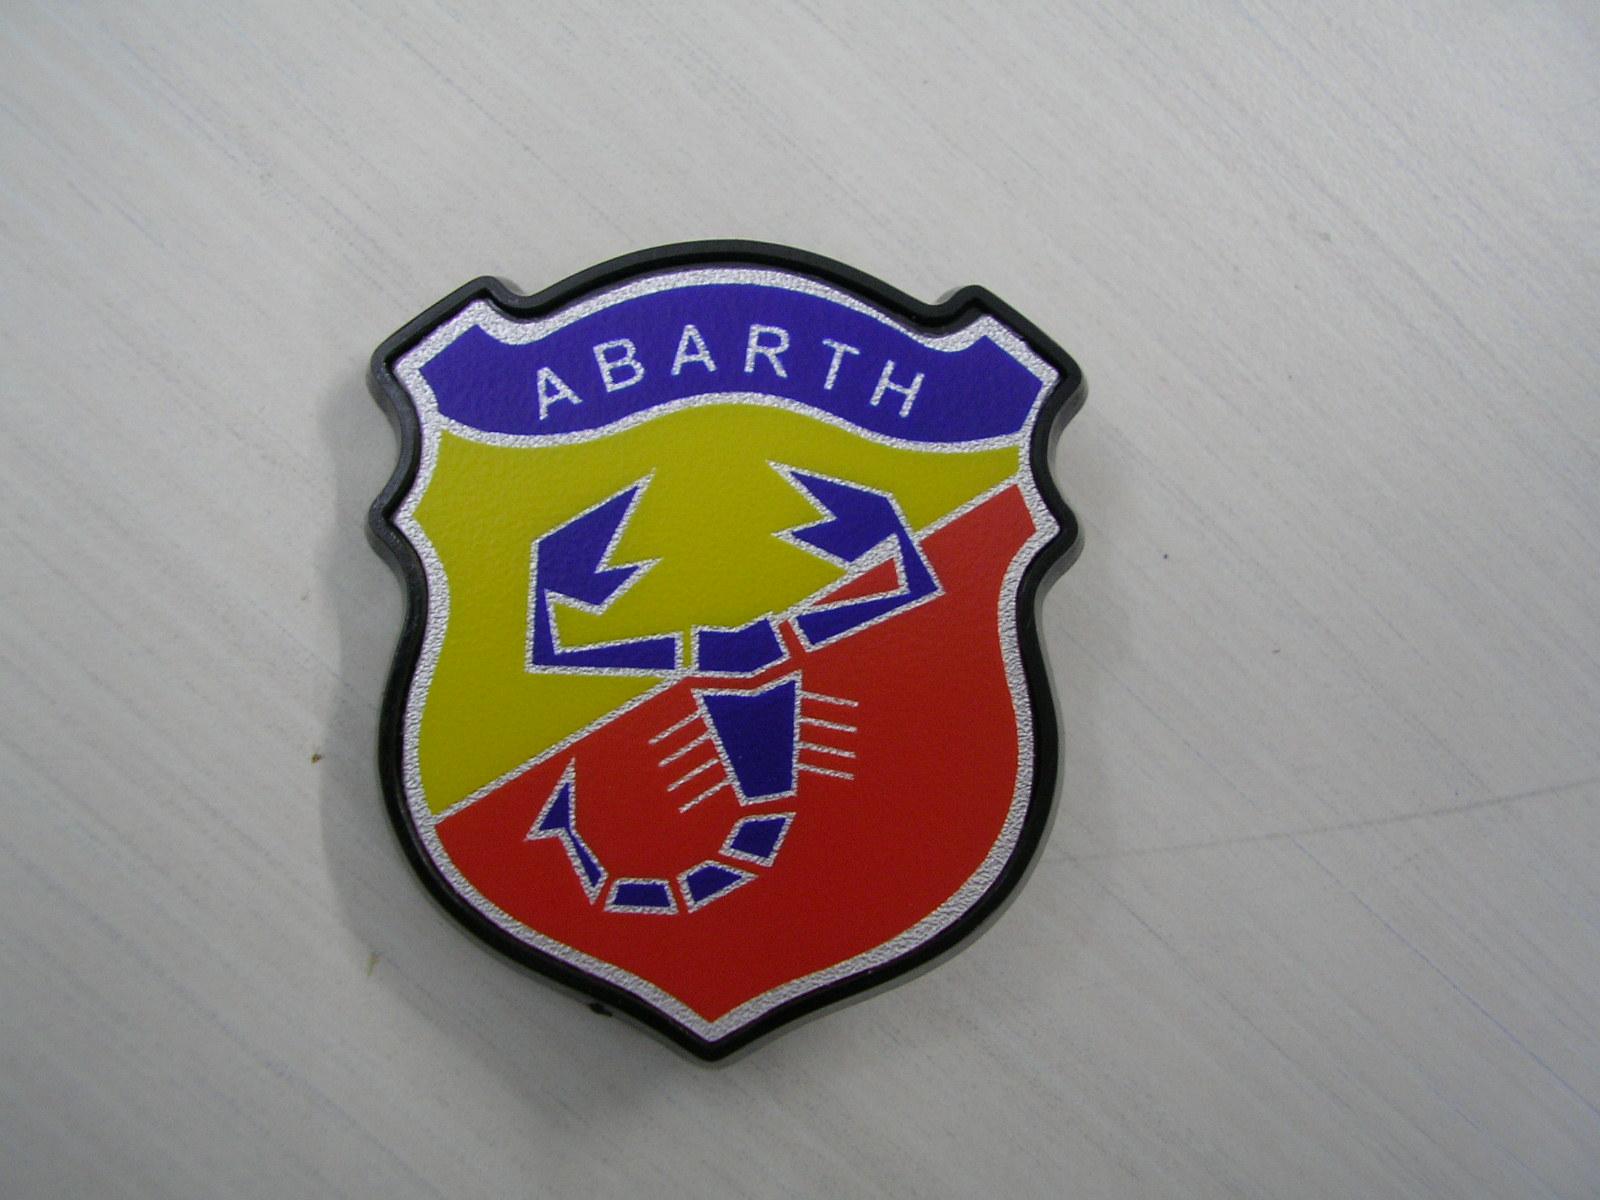 CategoriesFiat 500 /Abarth/